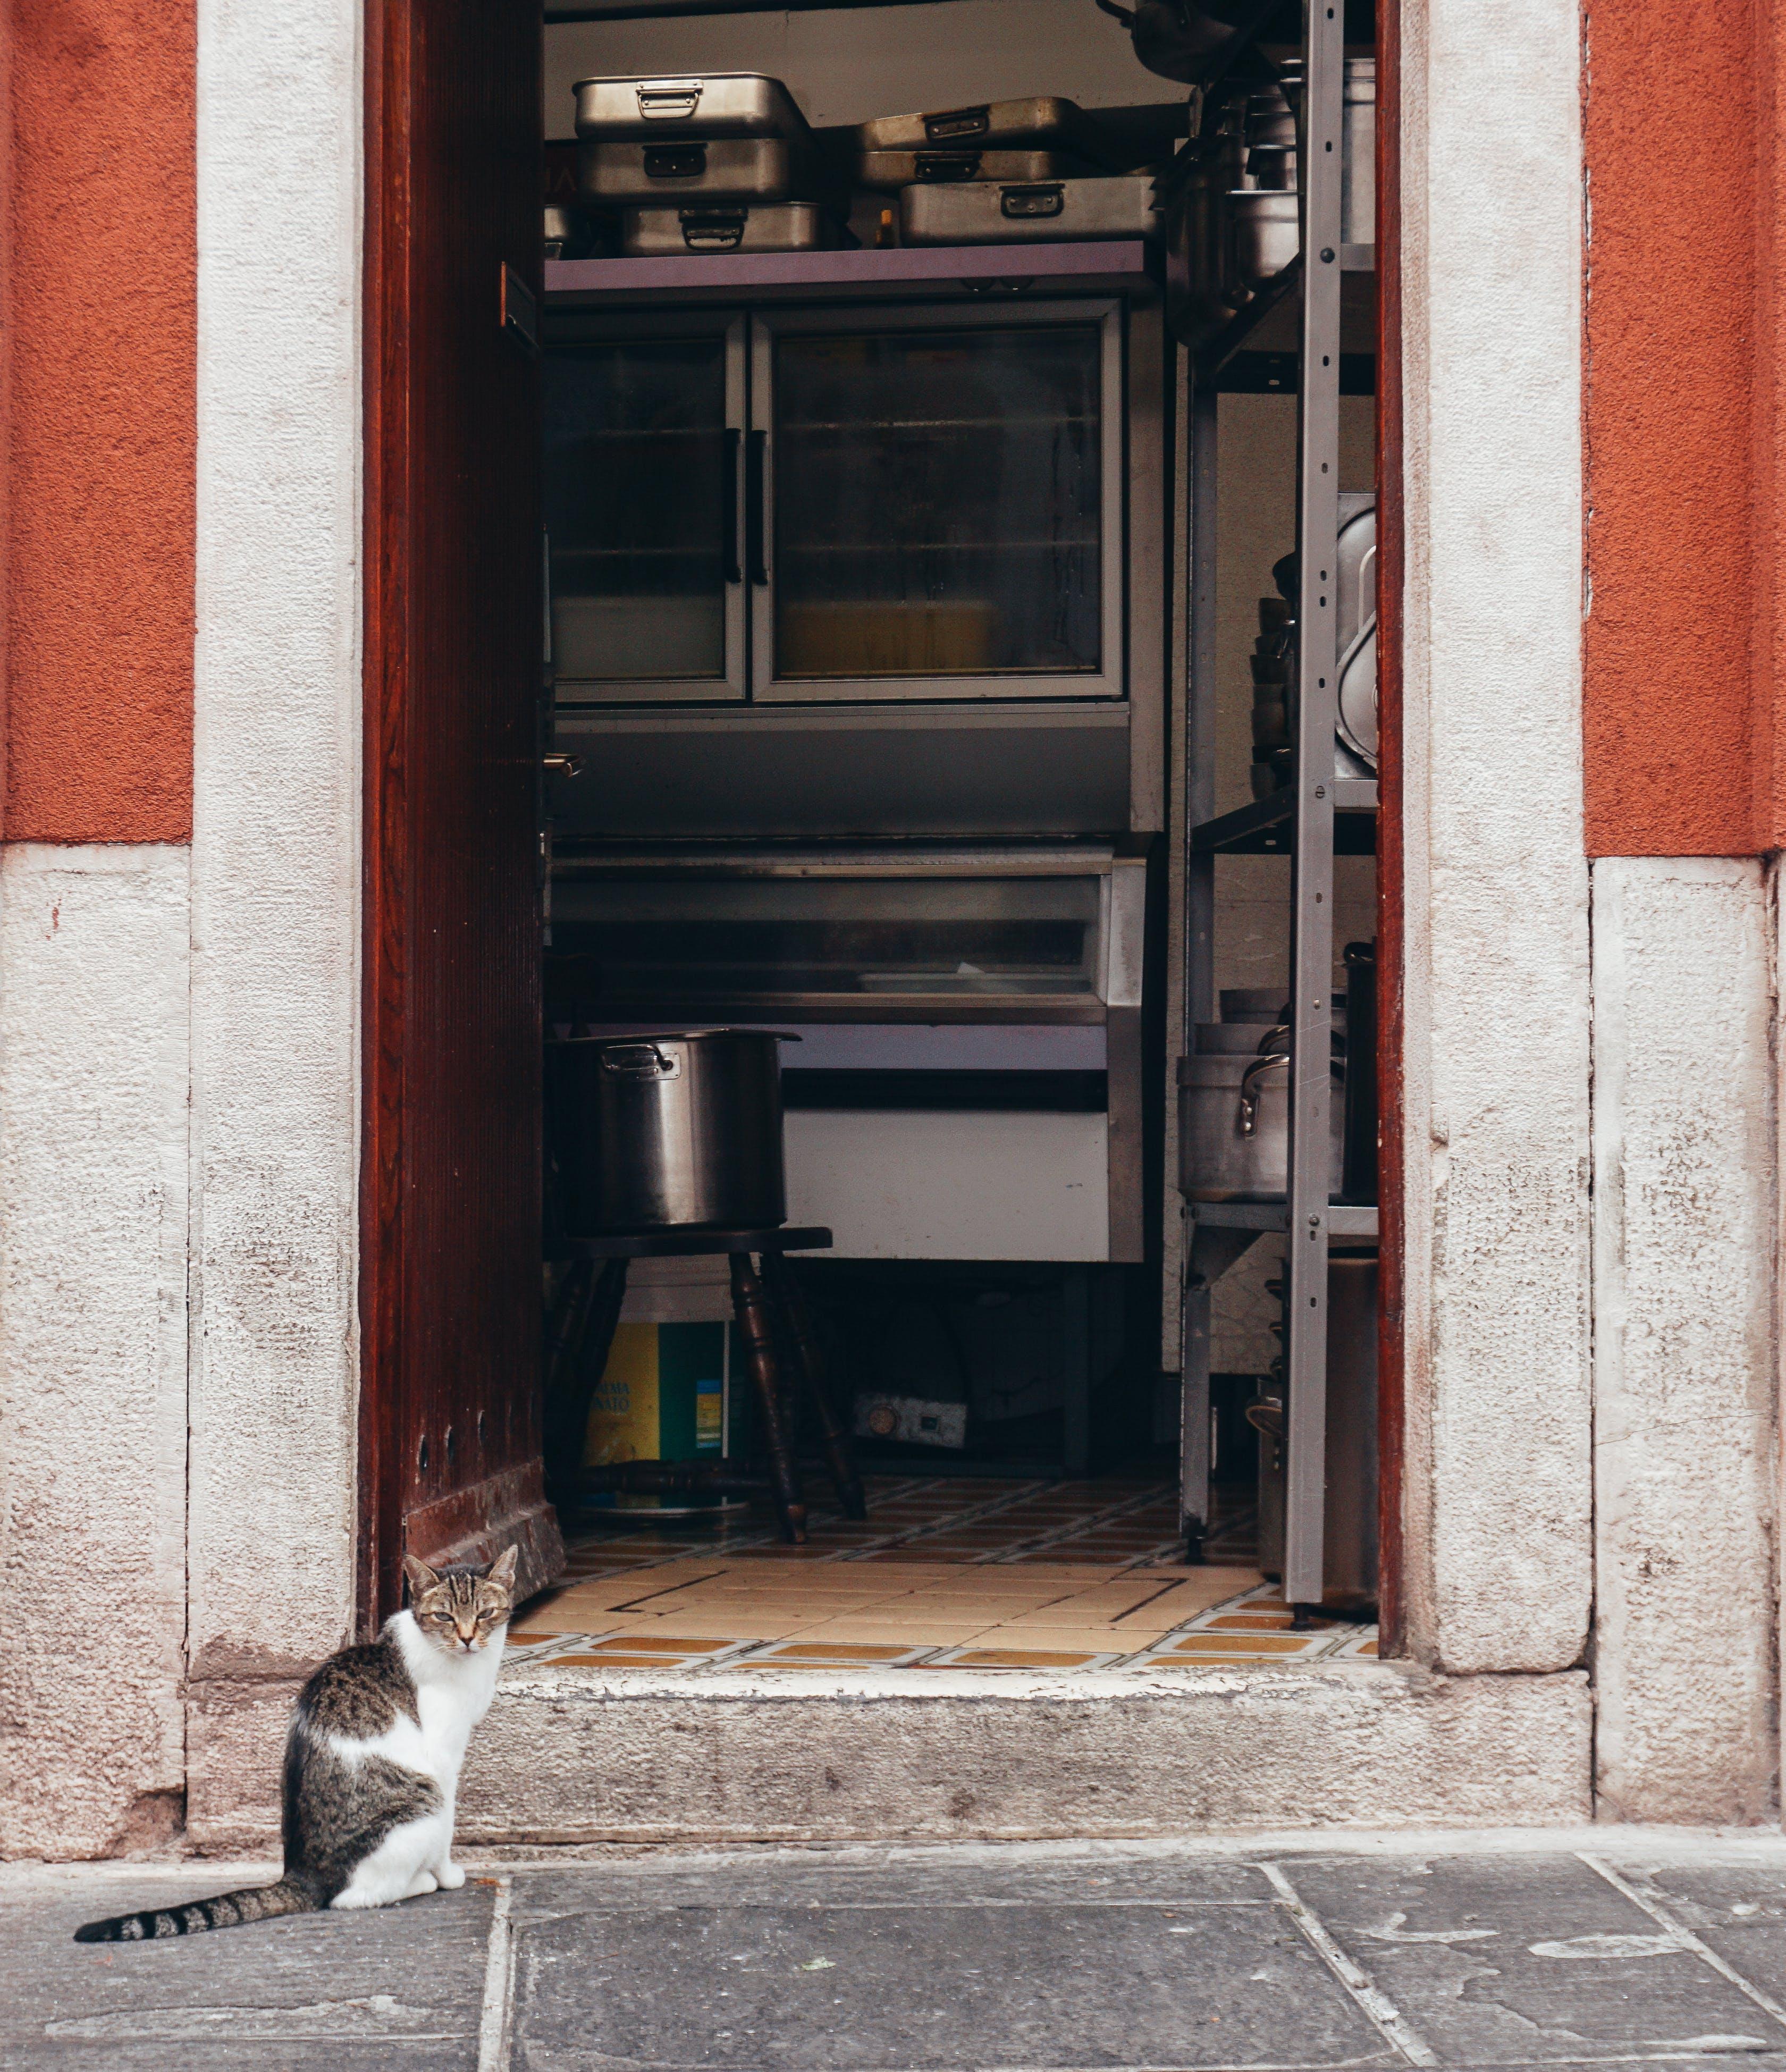 Free stock photo of cat, city, citylife, kitchen